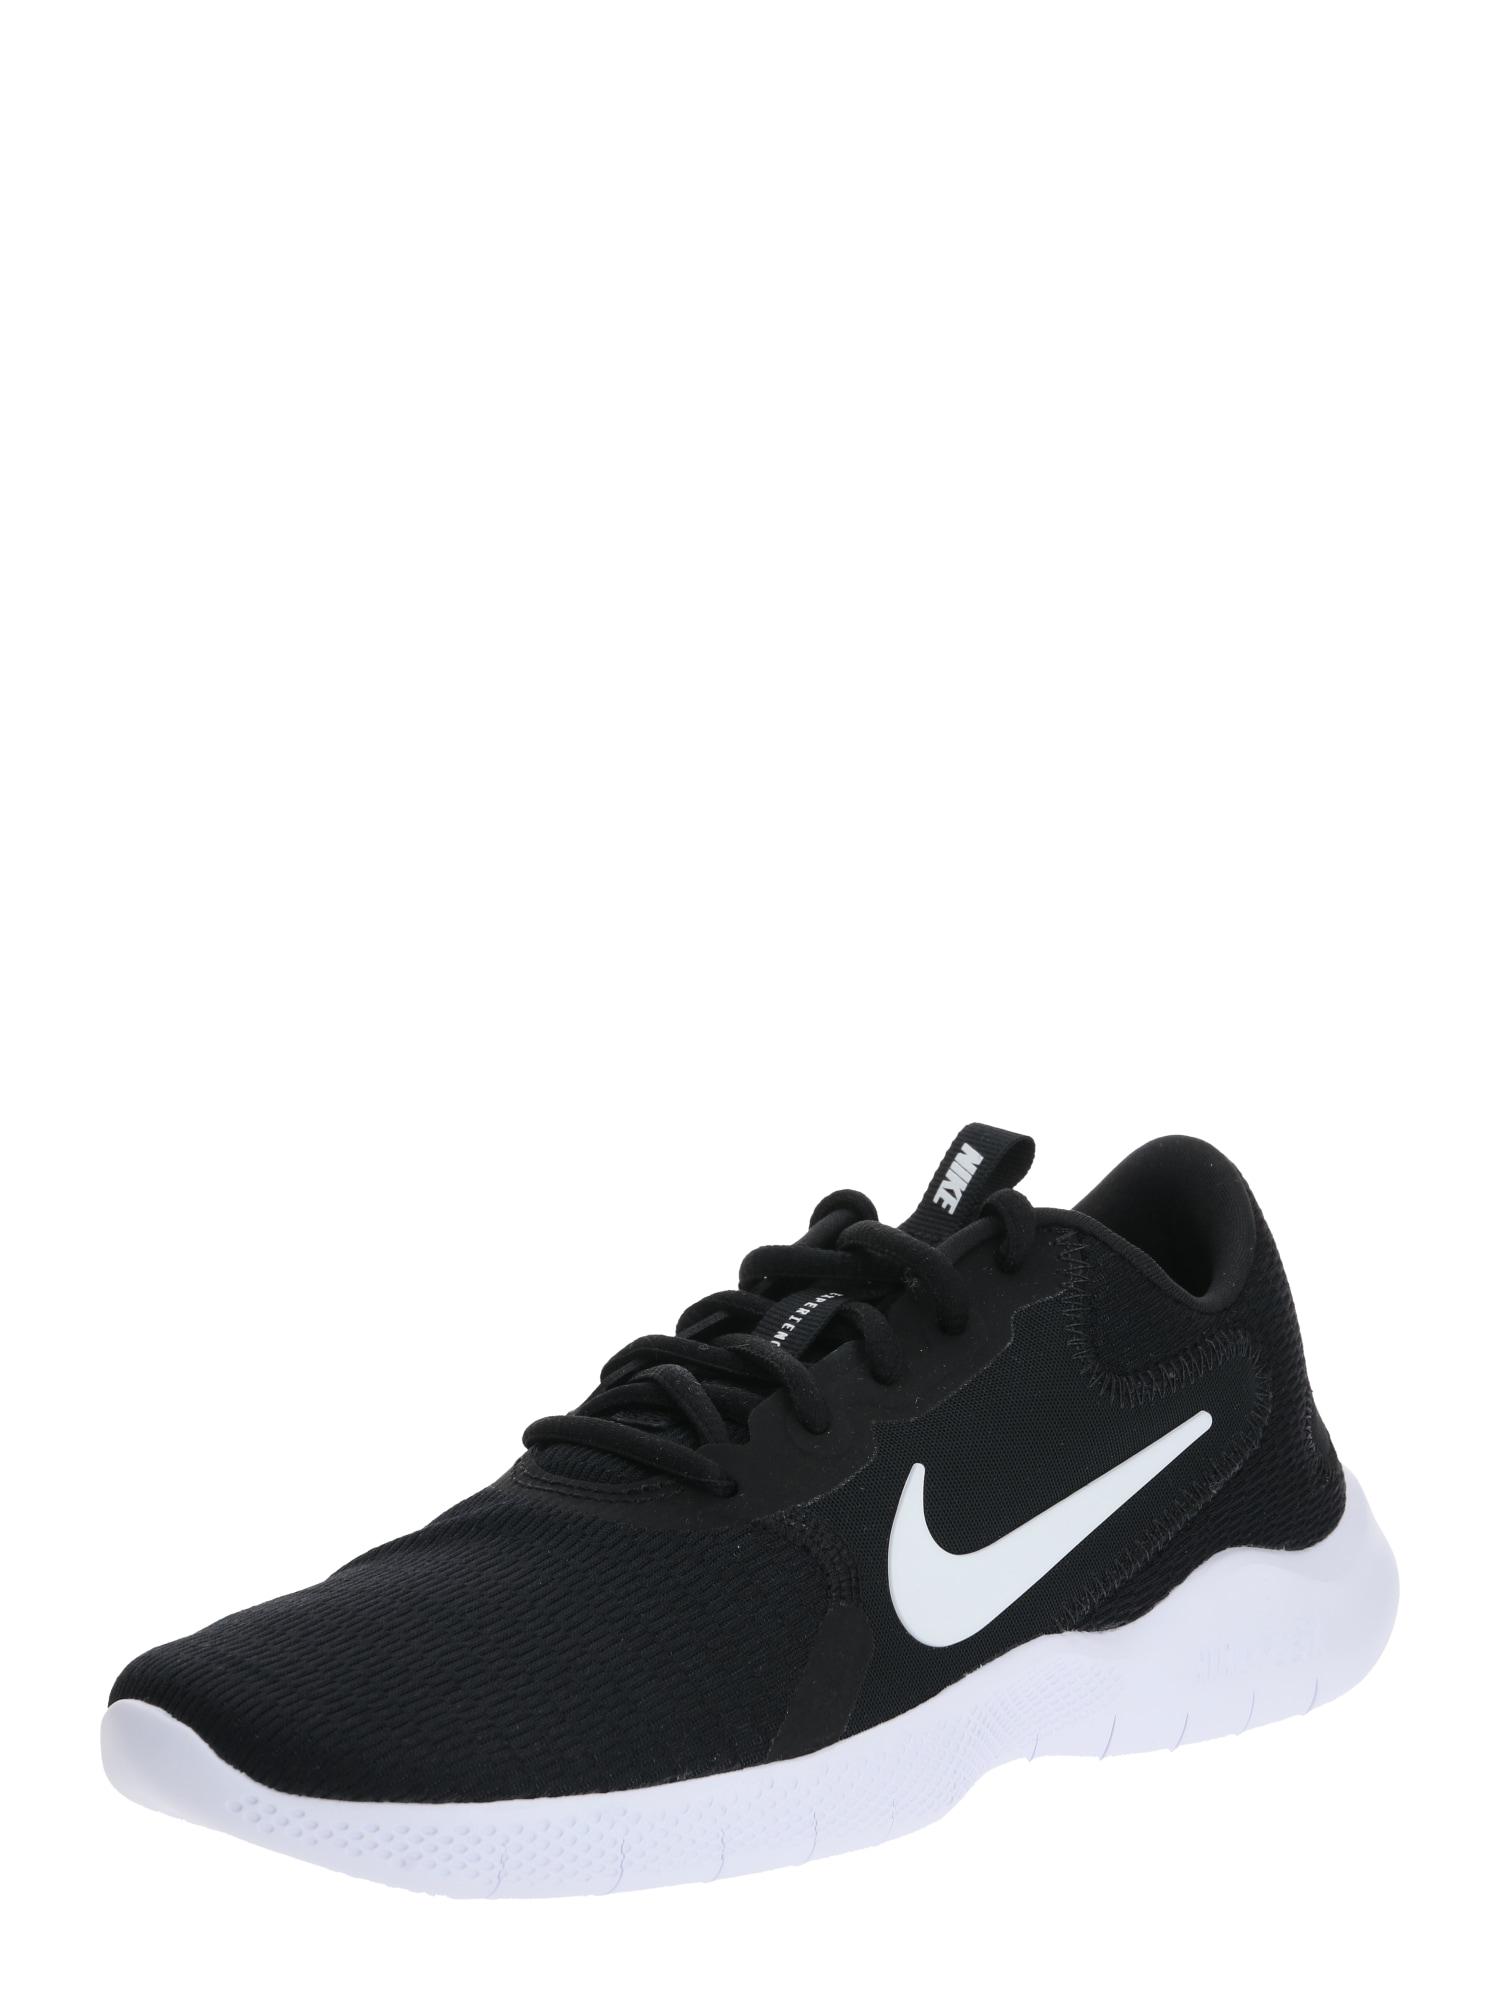 NIKE Bėgimo batai 'Flex Experience Run 9' juoda / balta